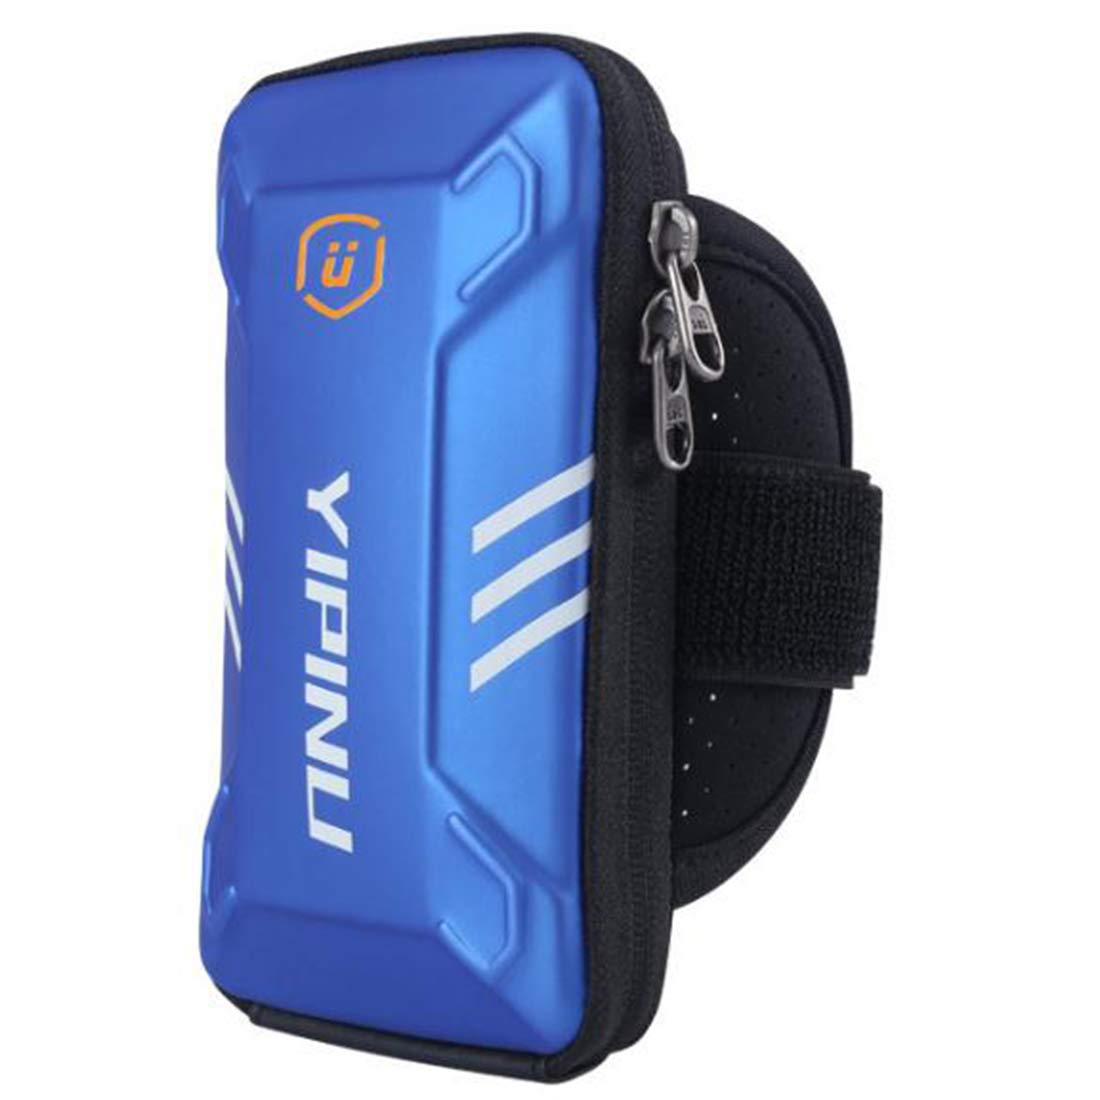 Hemengjuan Outdoor Cycling Equipment Fitness Running Arm Bag, Exercise Mobile Phone Arm Bag (Color : Blue) by Hemengjuan